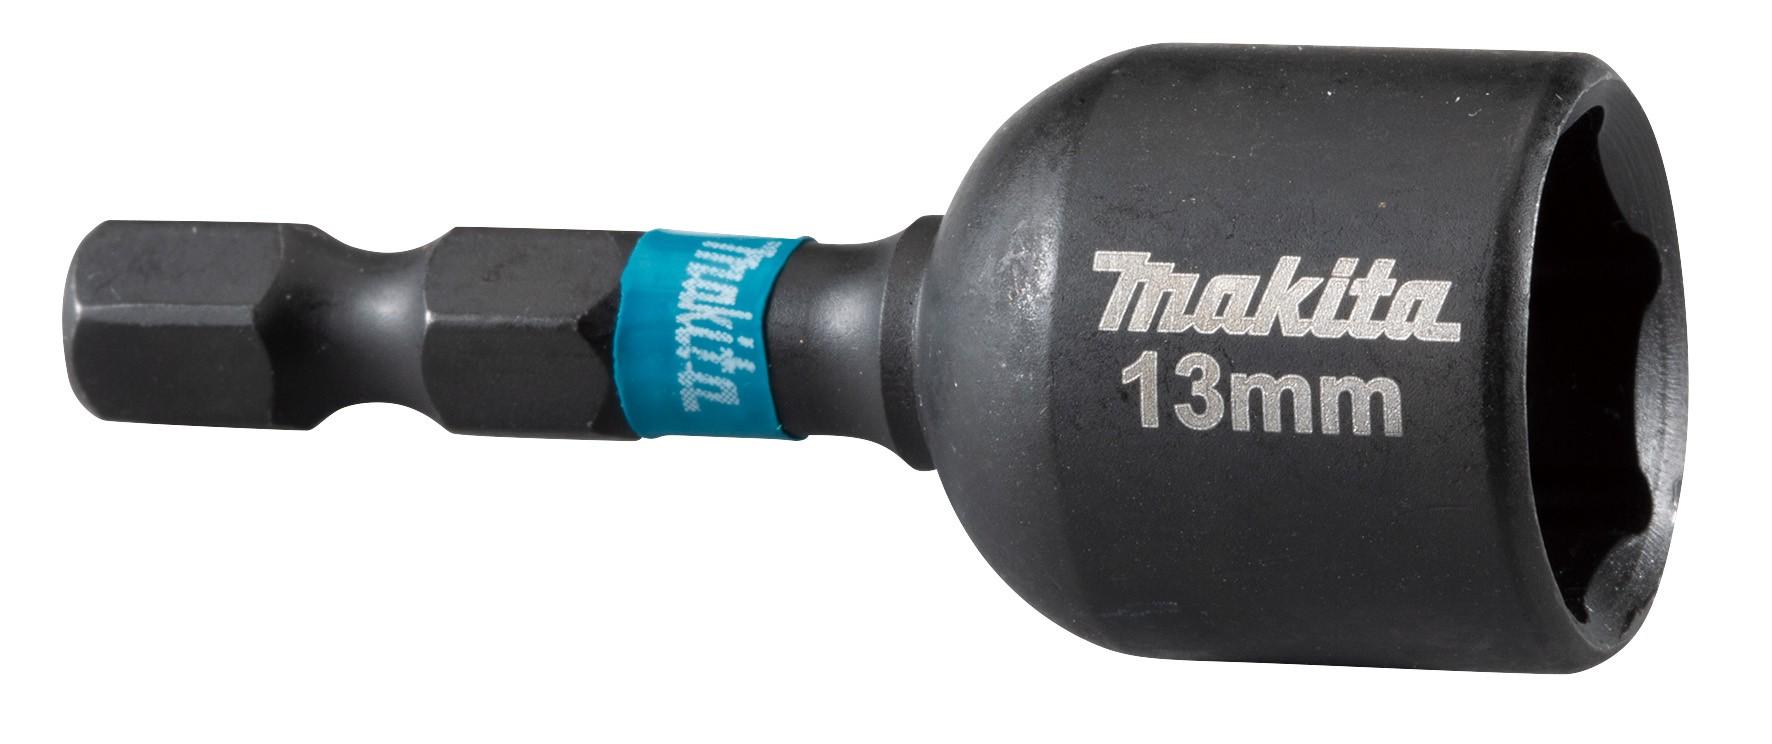 "Bit Soquete Magnetico 2"" 13mm B-66852 Makita"